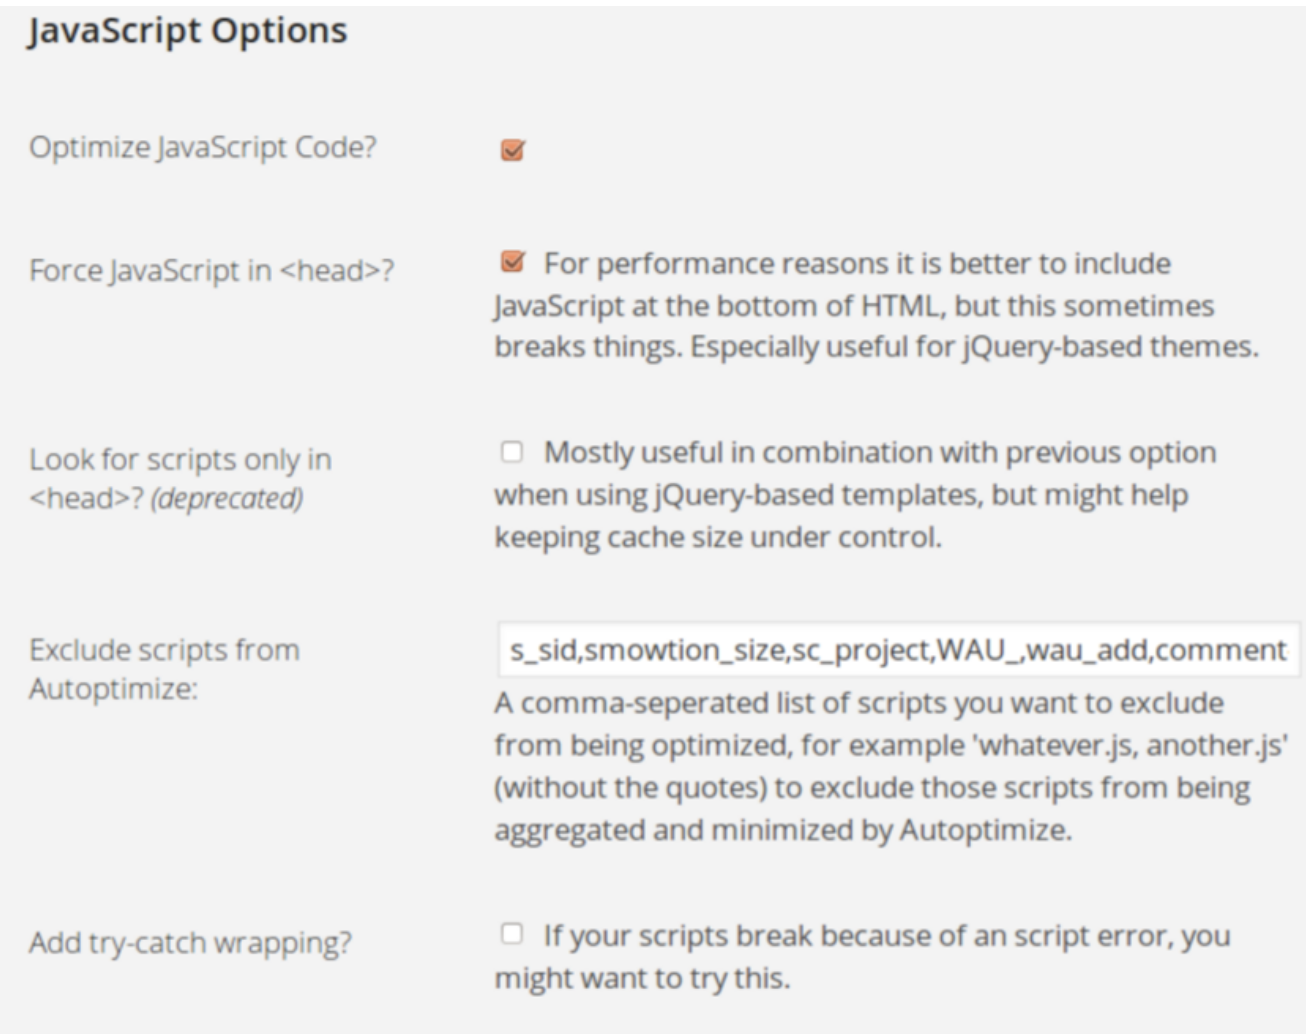 "Autoptimize-wordpress-plugin ""width ="" 1500 ""style ="" width: 1500px; blocco di visualizzazione; margine: 0px auto; ""srcset ="" https://blog.hubspot.com/hs-fs/hubfs/Autoptimize.png?width=750&name=Autoptimize.png 750w, https://blog.hubspot.com/hs- fs/hubfs/Autoptimize.png?width=1500&name=Autoptimize.png 1500w, https://blog.hubspot.com/hs-fs/hubfs/Autoptimize.png?width=2250&name=Autoptimize.png 2250w, https:// blog.hubspot.com/hs-fs/hubfs/Autoptimize.png?width=3000&name=Autoptimize.png 3000w, https://blog.hubspot.com/hs-fs/hubfs/Autoptimize.png?width=3750&name=Autoptimize .png 3750w, https://blog.hubspot.com/hs-fs/hubfs/Autoptimize.png?width=4500&name=Autoptimize.png 4500w"" sizes=""(max-width: 1500px) 100vw, 1500px"